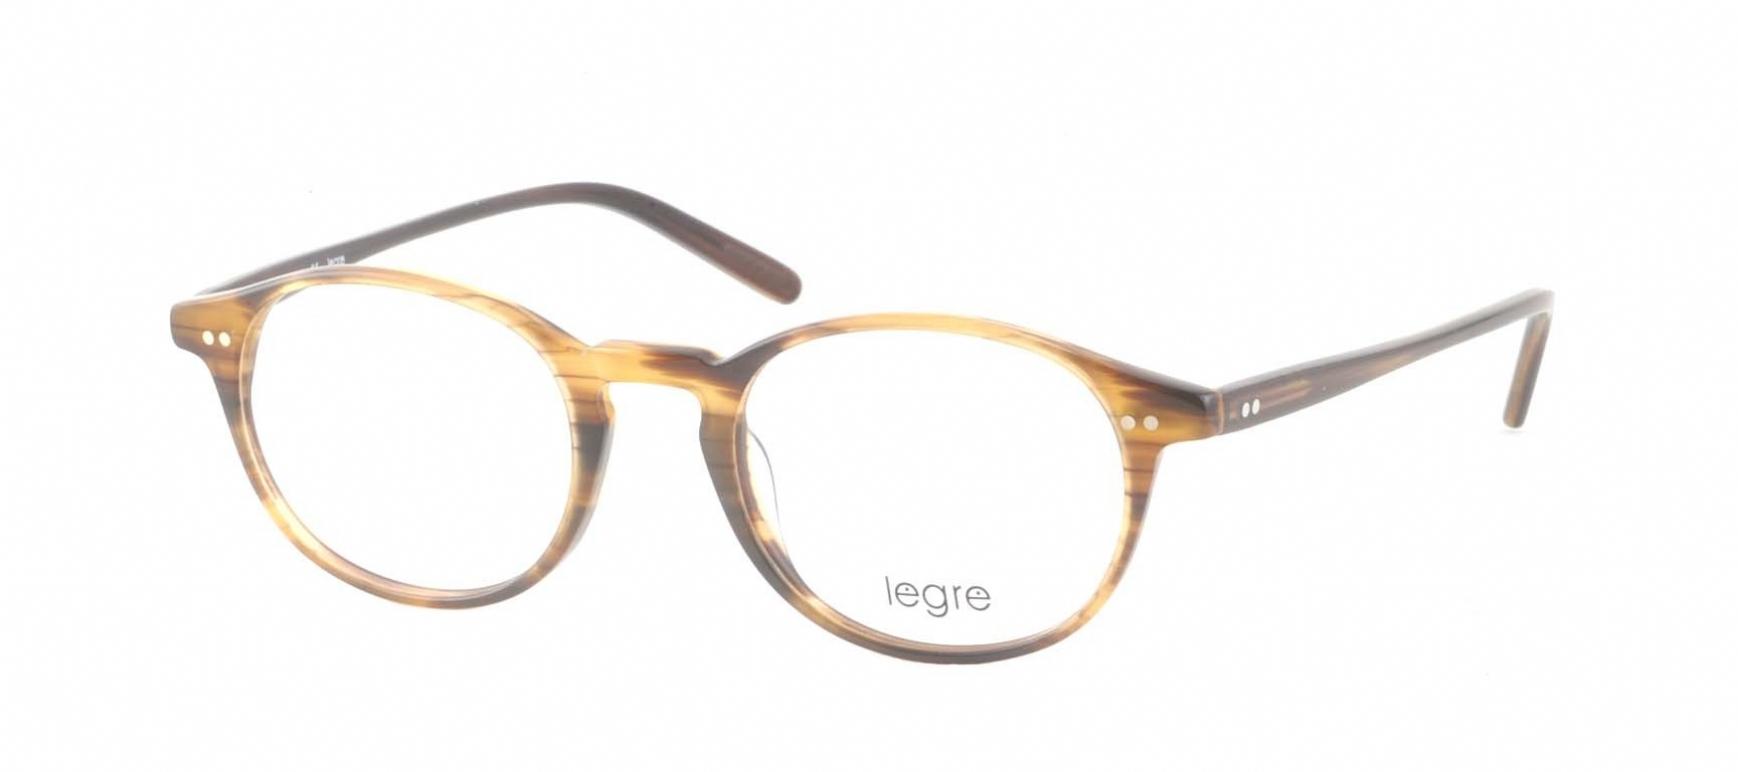 1d939e41d4 Legre 271 Eyeglasses